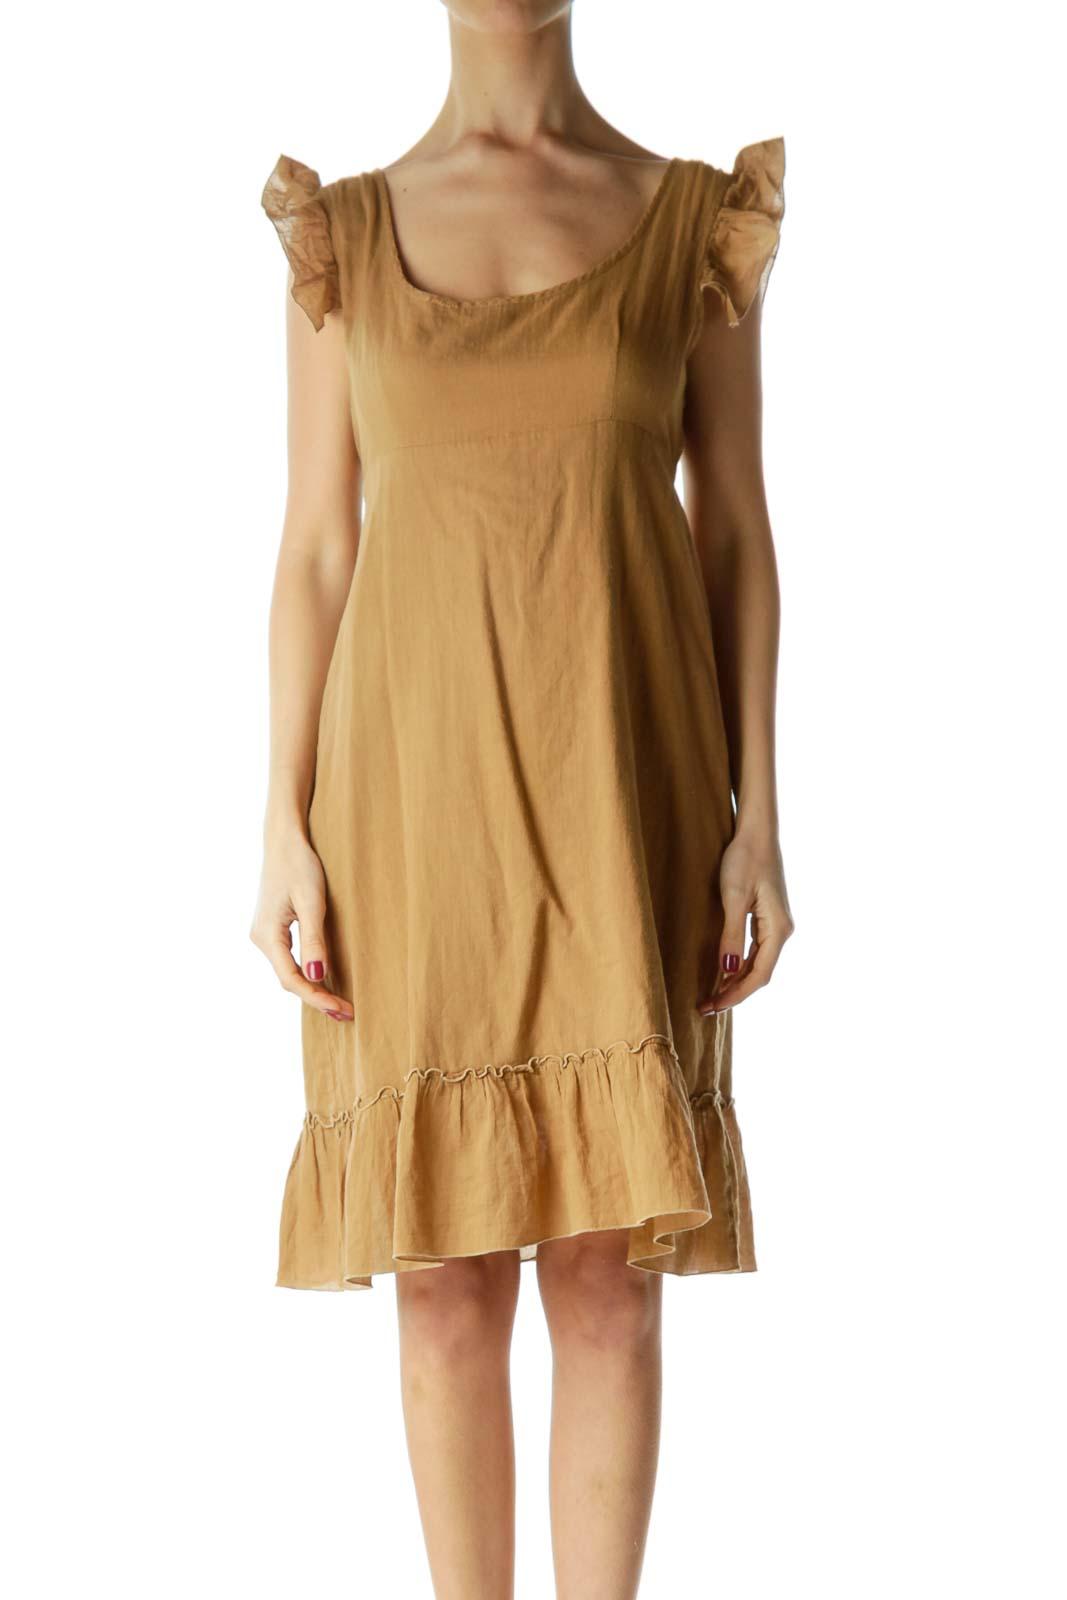 Brown Ruffled Cap Sleeve Day Dress